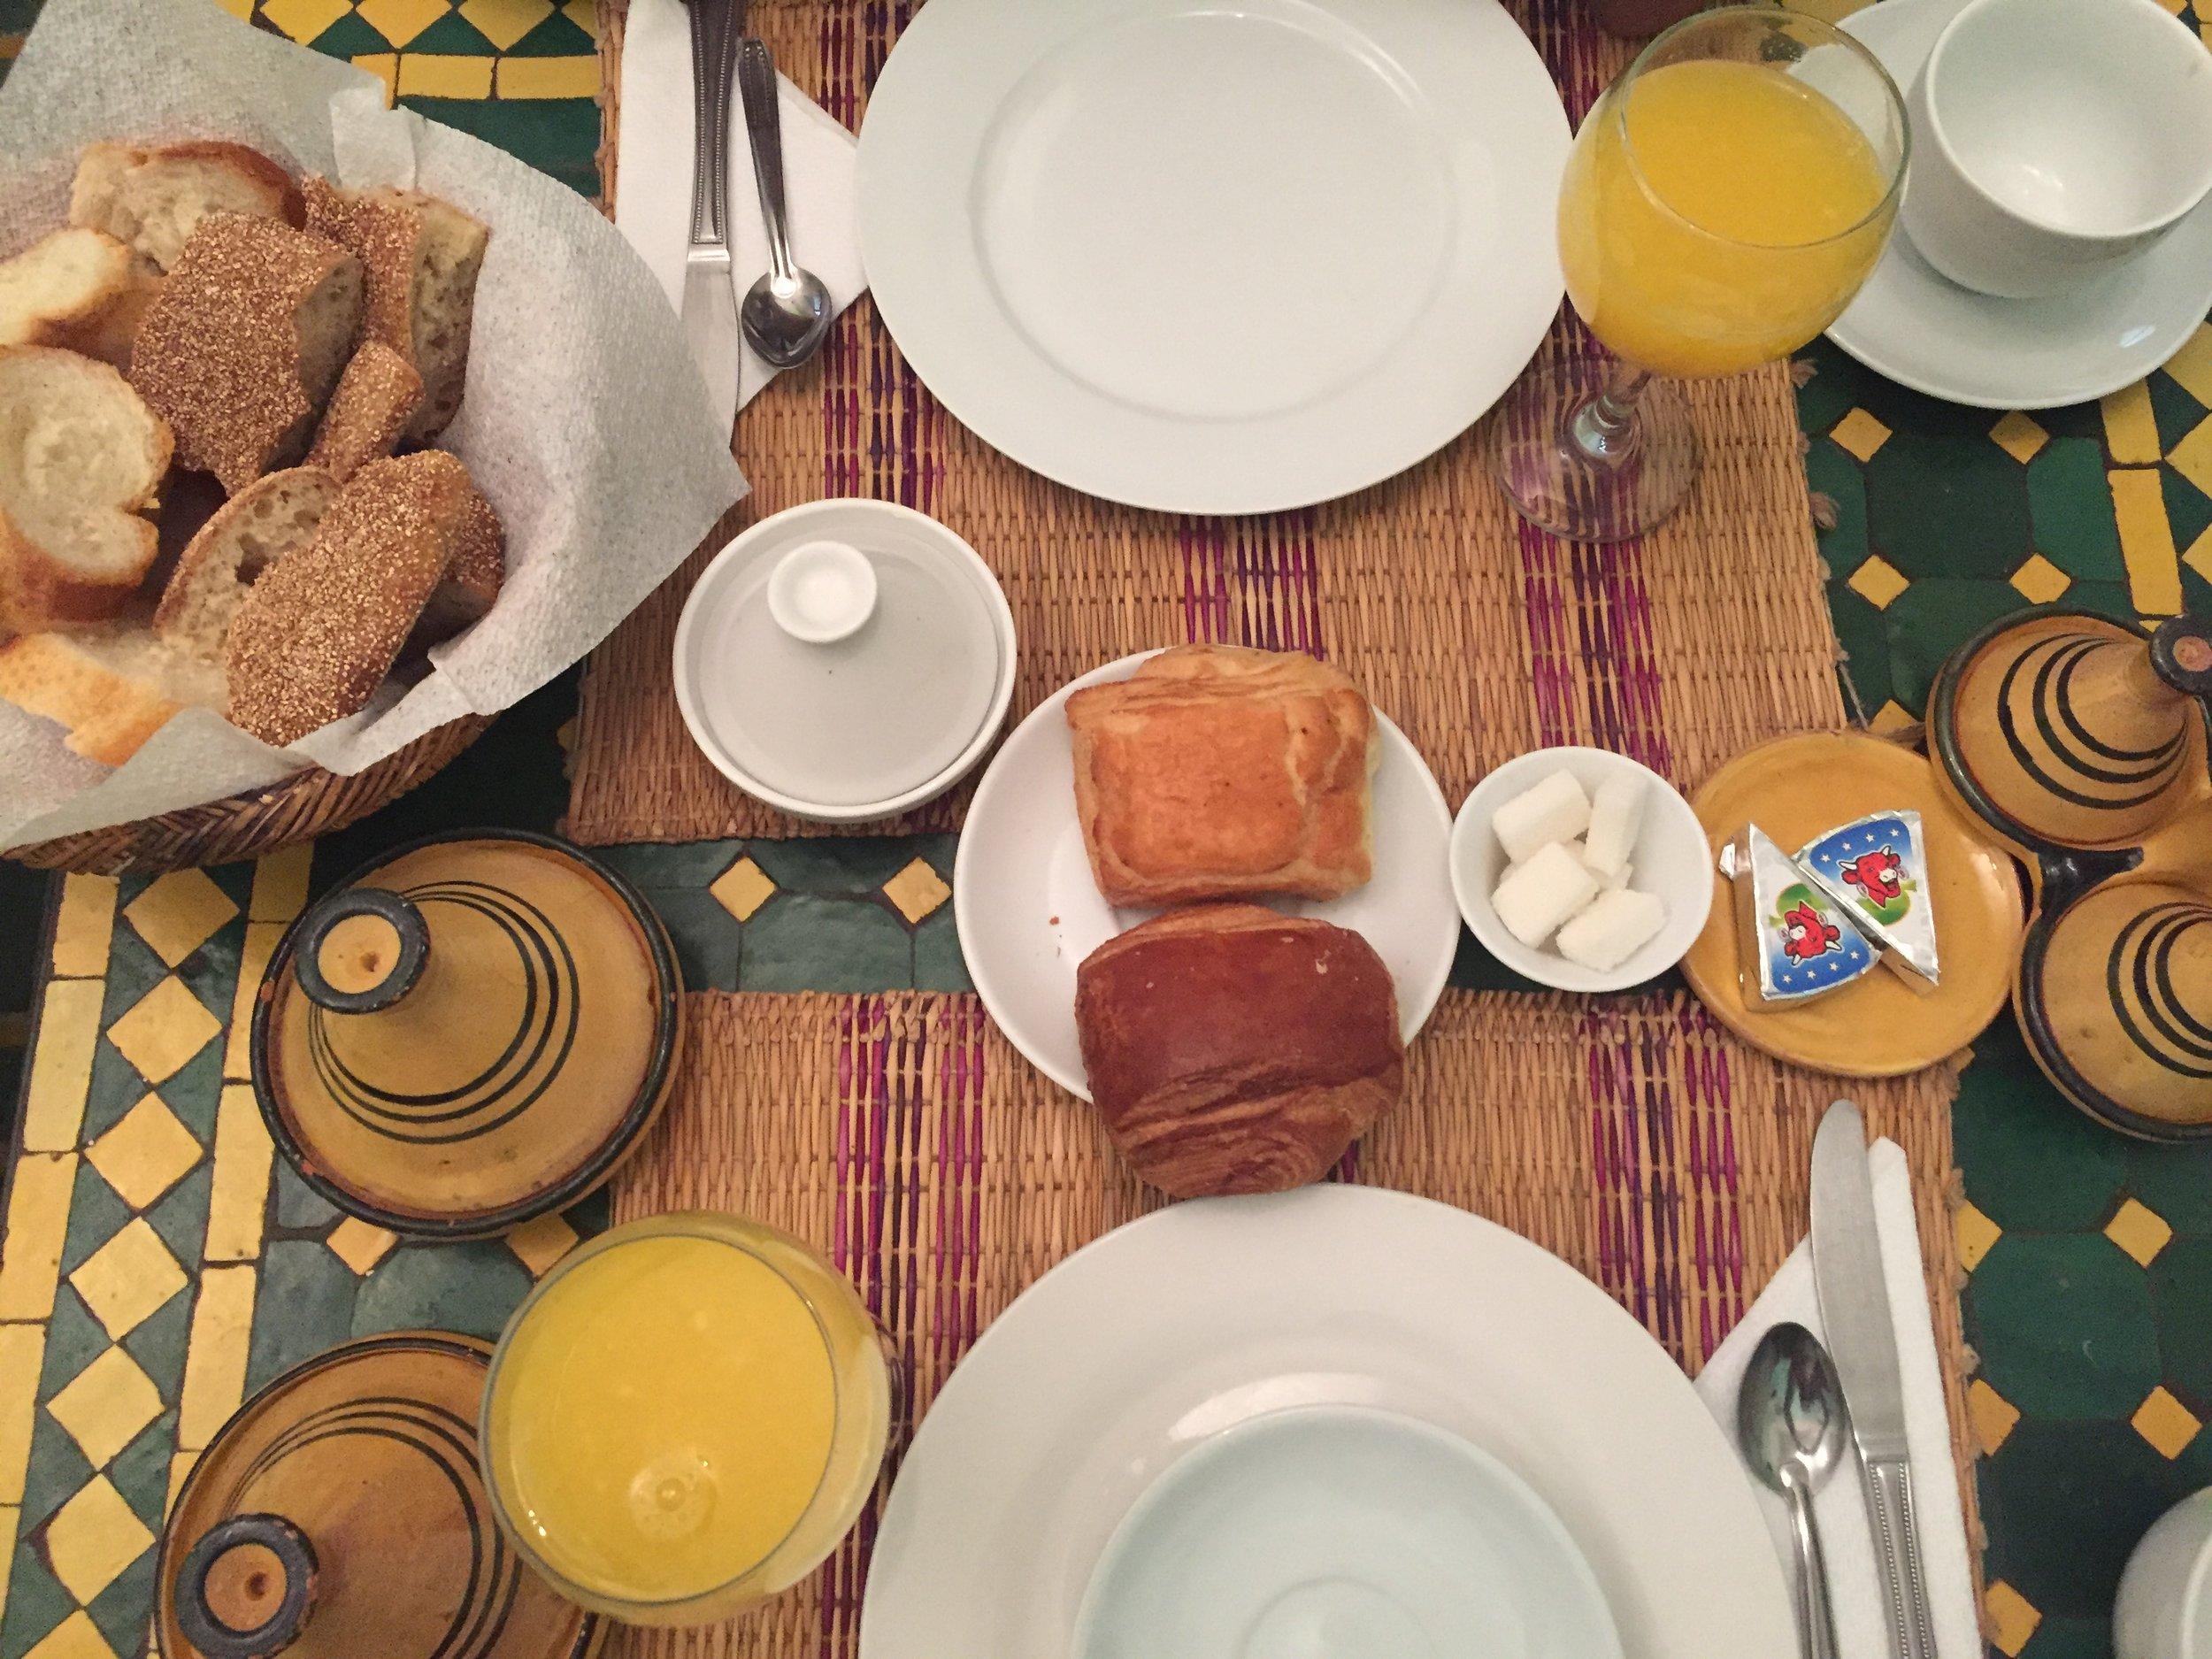 Fancy moroccan breakfast with freshly squeezed orange juice, bread, tea, crepes, jam, cheese.